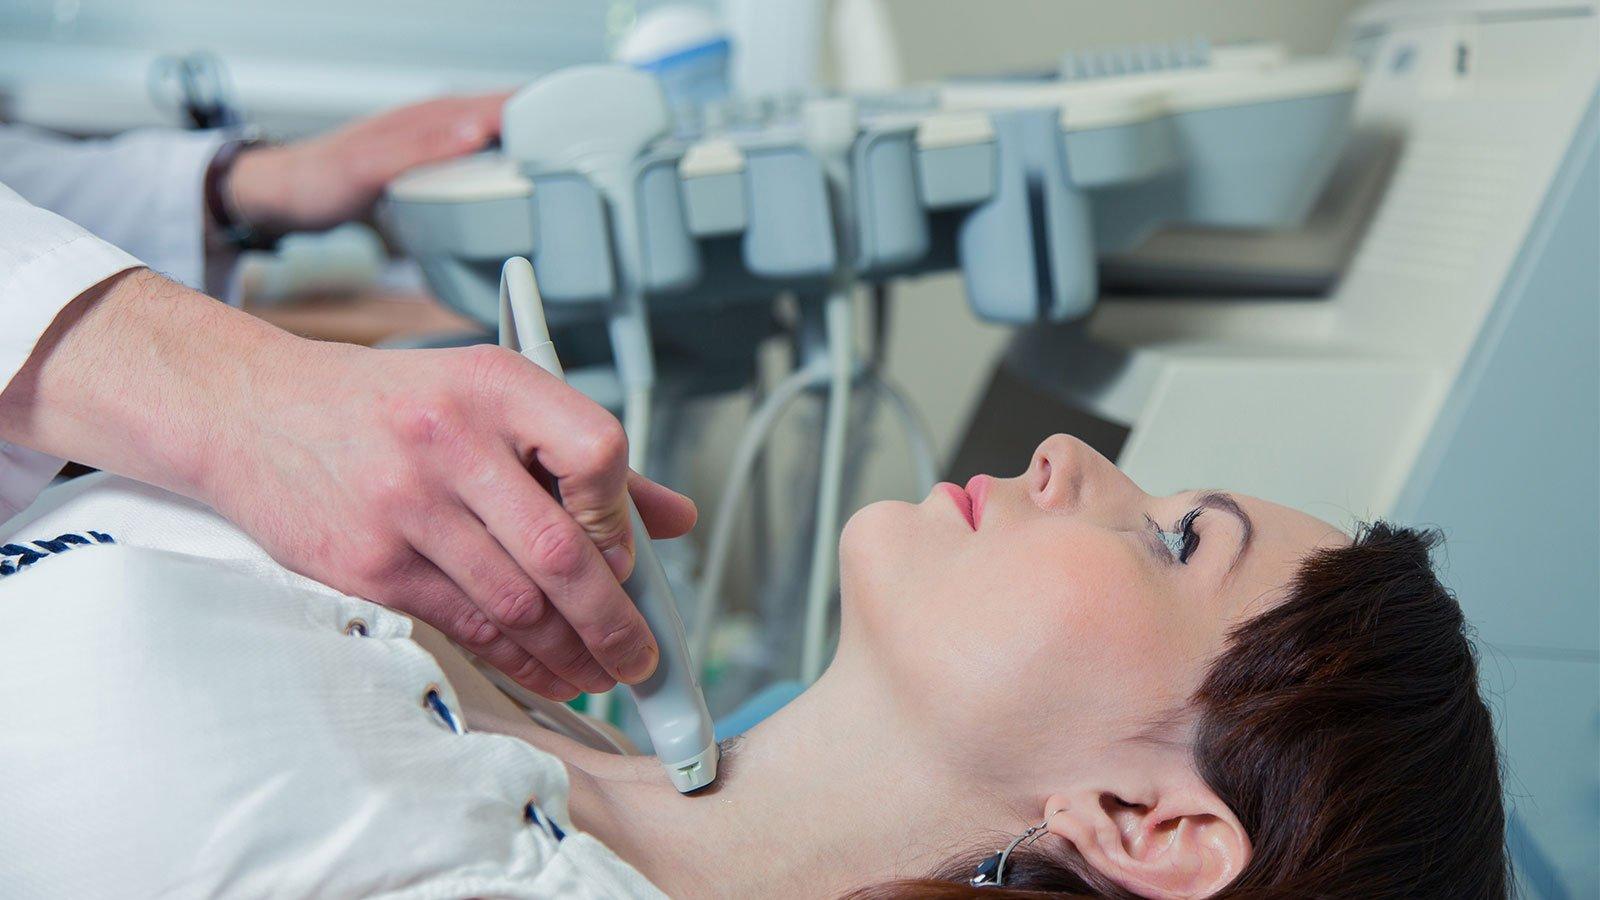 donna sottoposta a esame a ultrasuoni